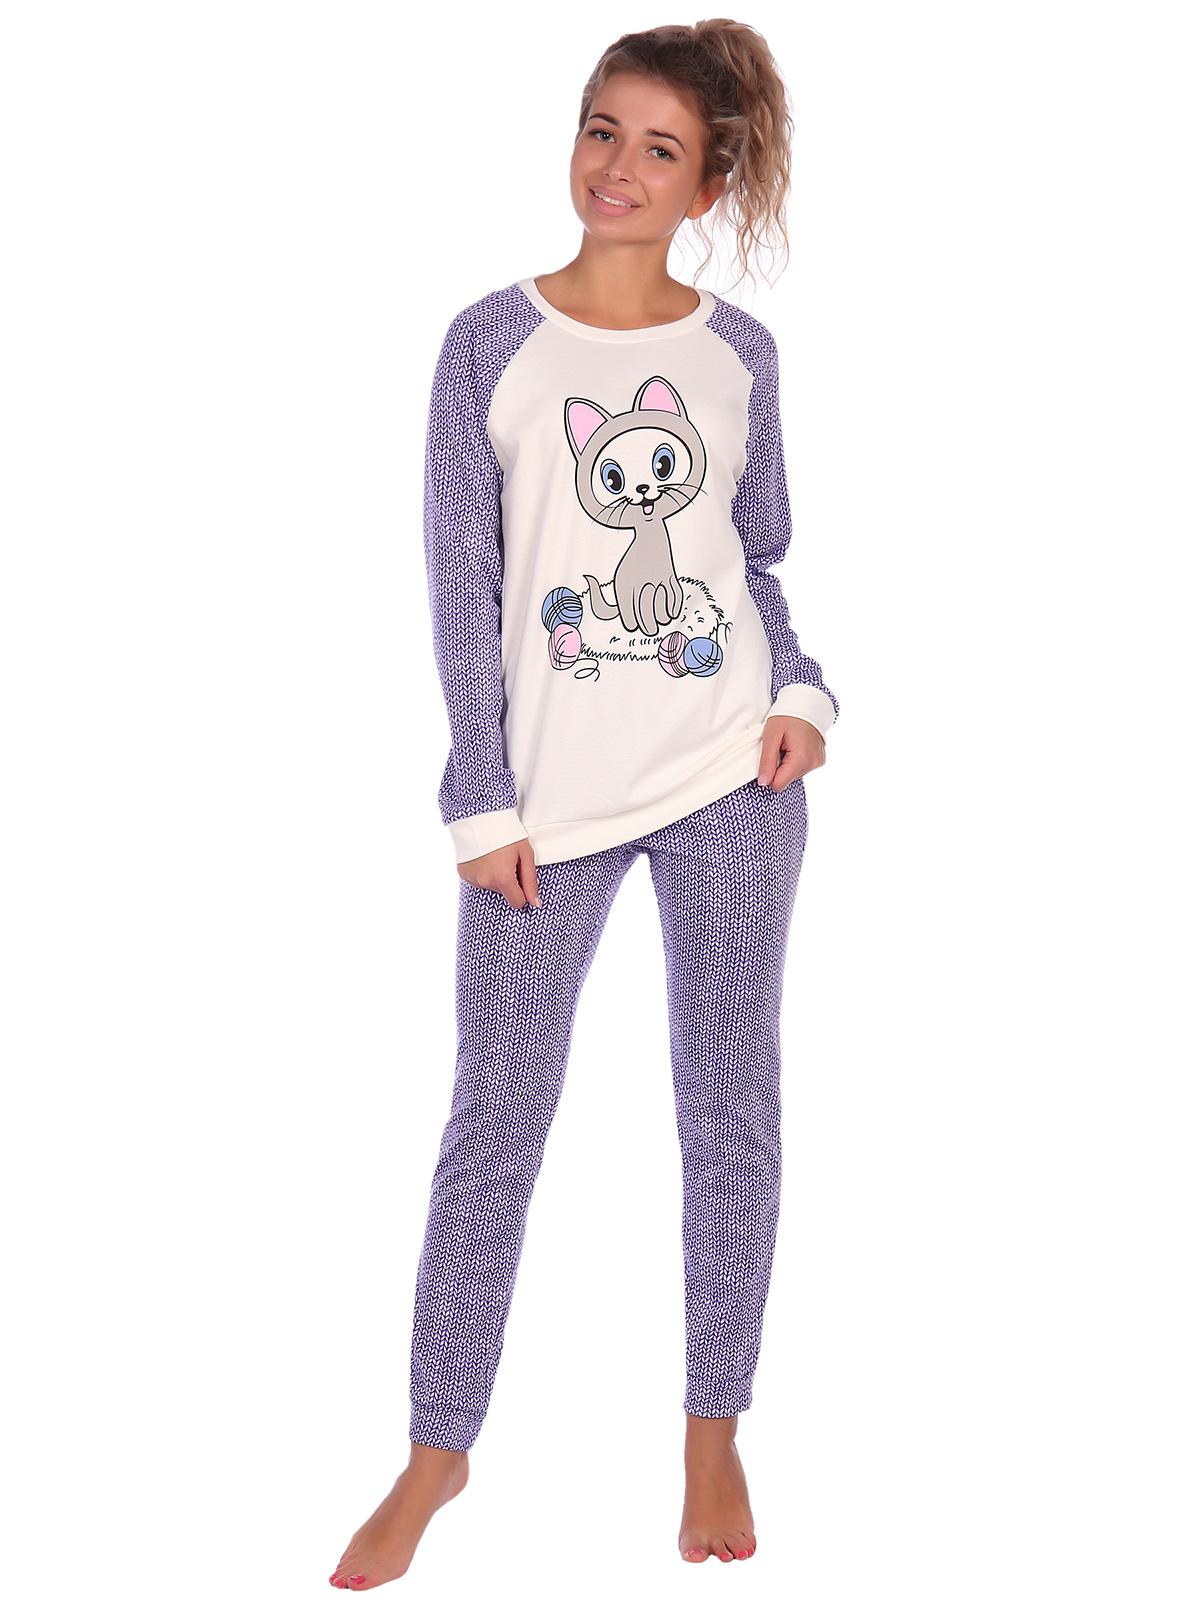 Жен. пижама арт. 16-0615 Фиолетовый р. 64 фото